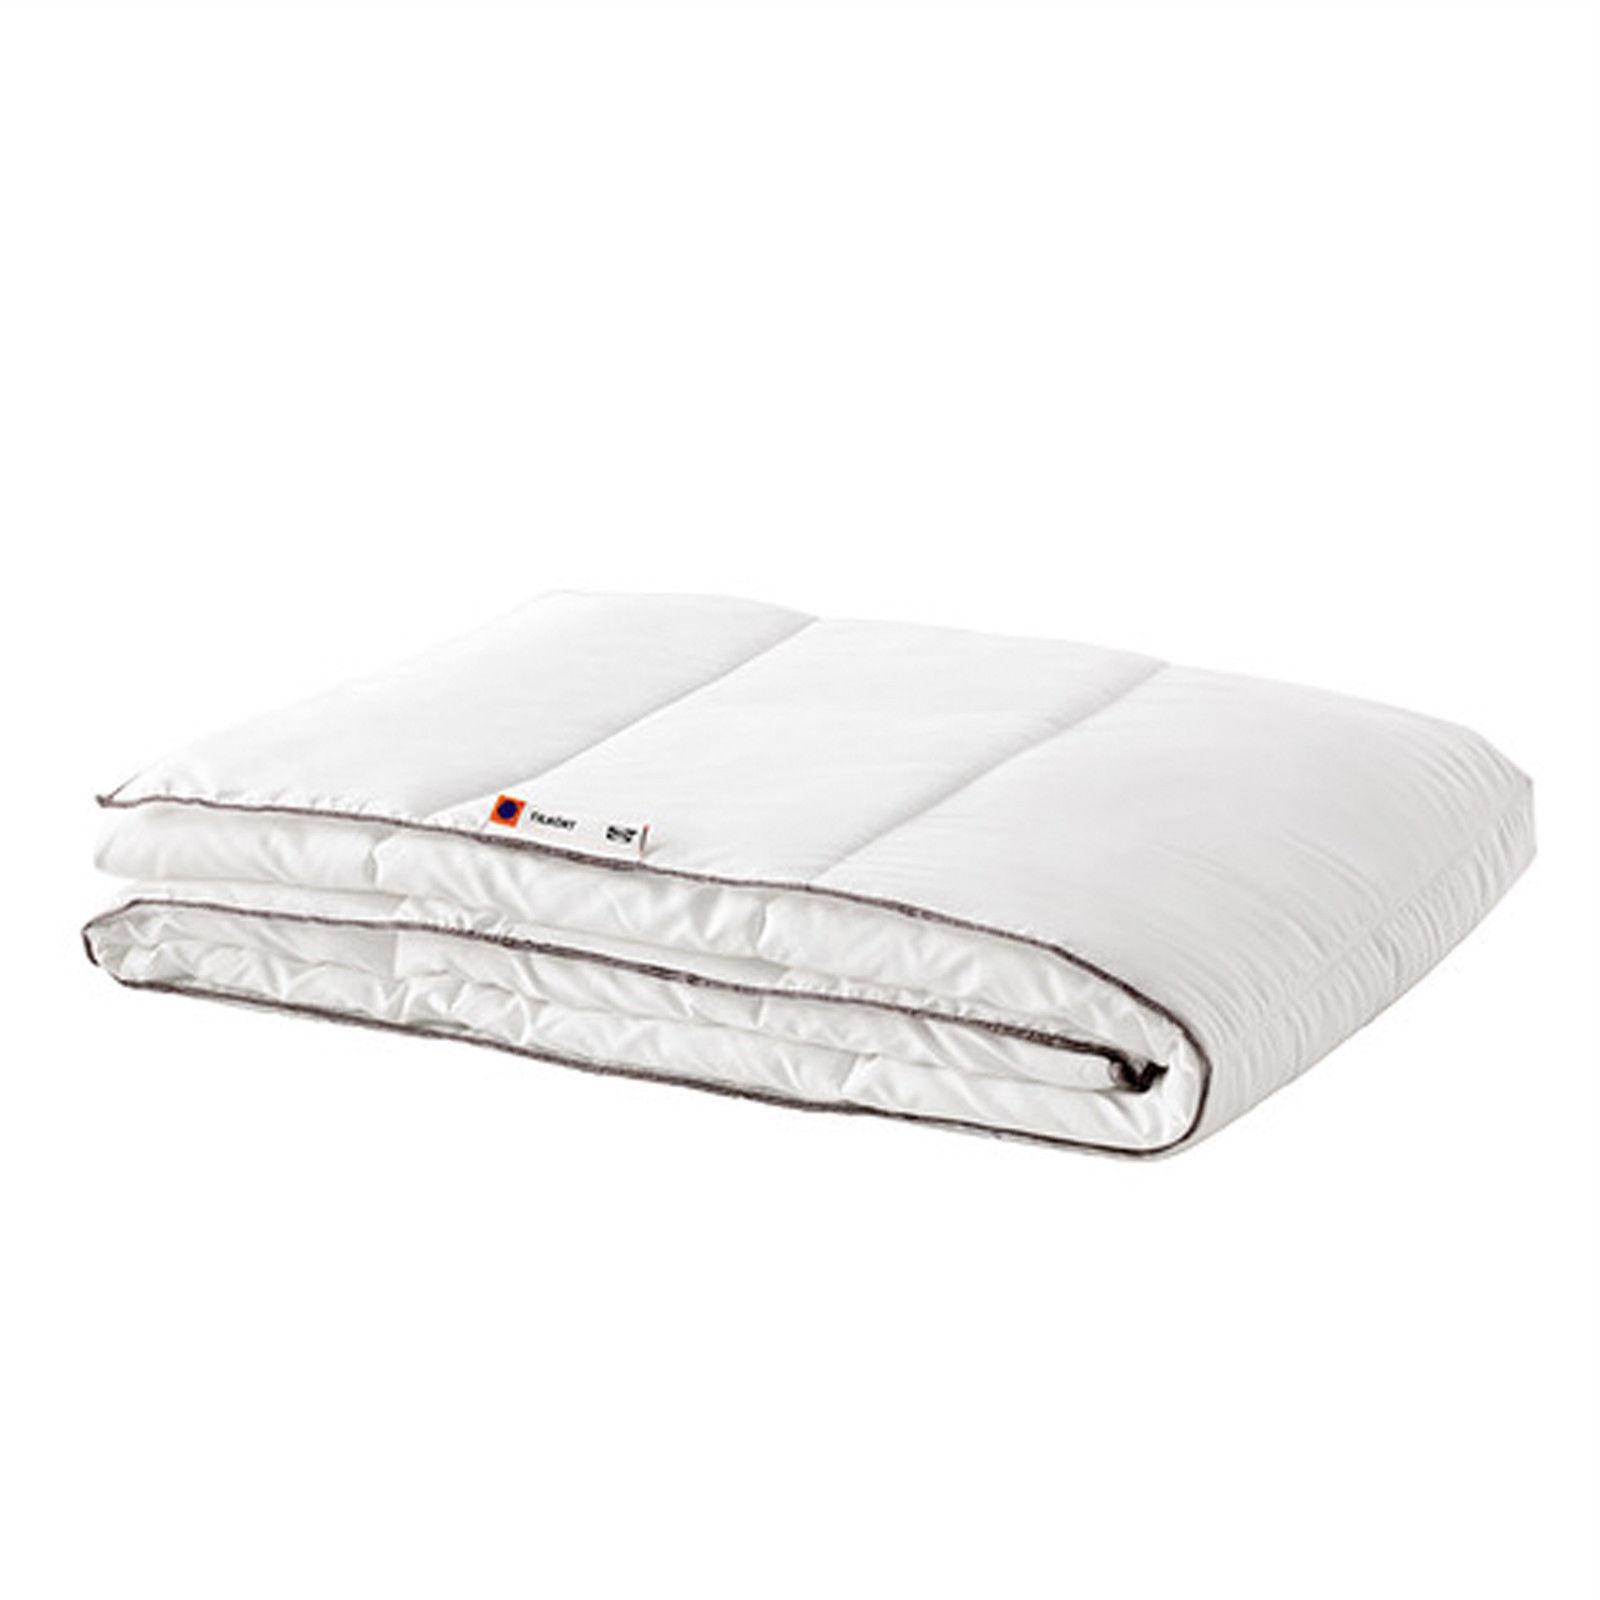 Bezaubernd Steppbett Dekoration Von Ikea-bettdecke-240×220-cm-decke-steppdecke-steppbett-